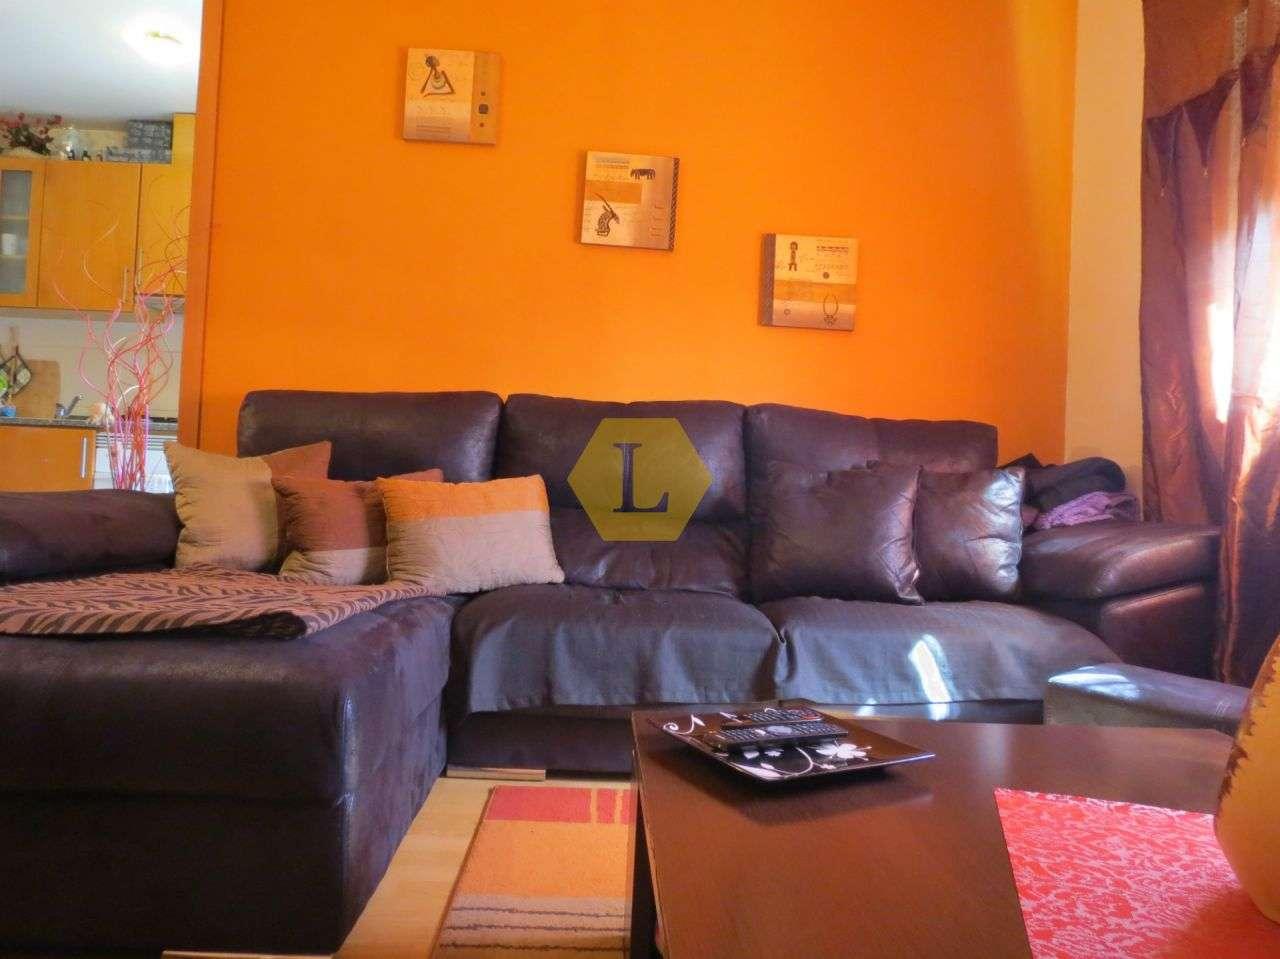 Apartamento para comprar, Gafanha da Nazaré, Aveiro - Foto 4